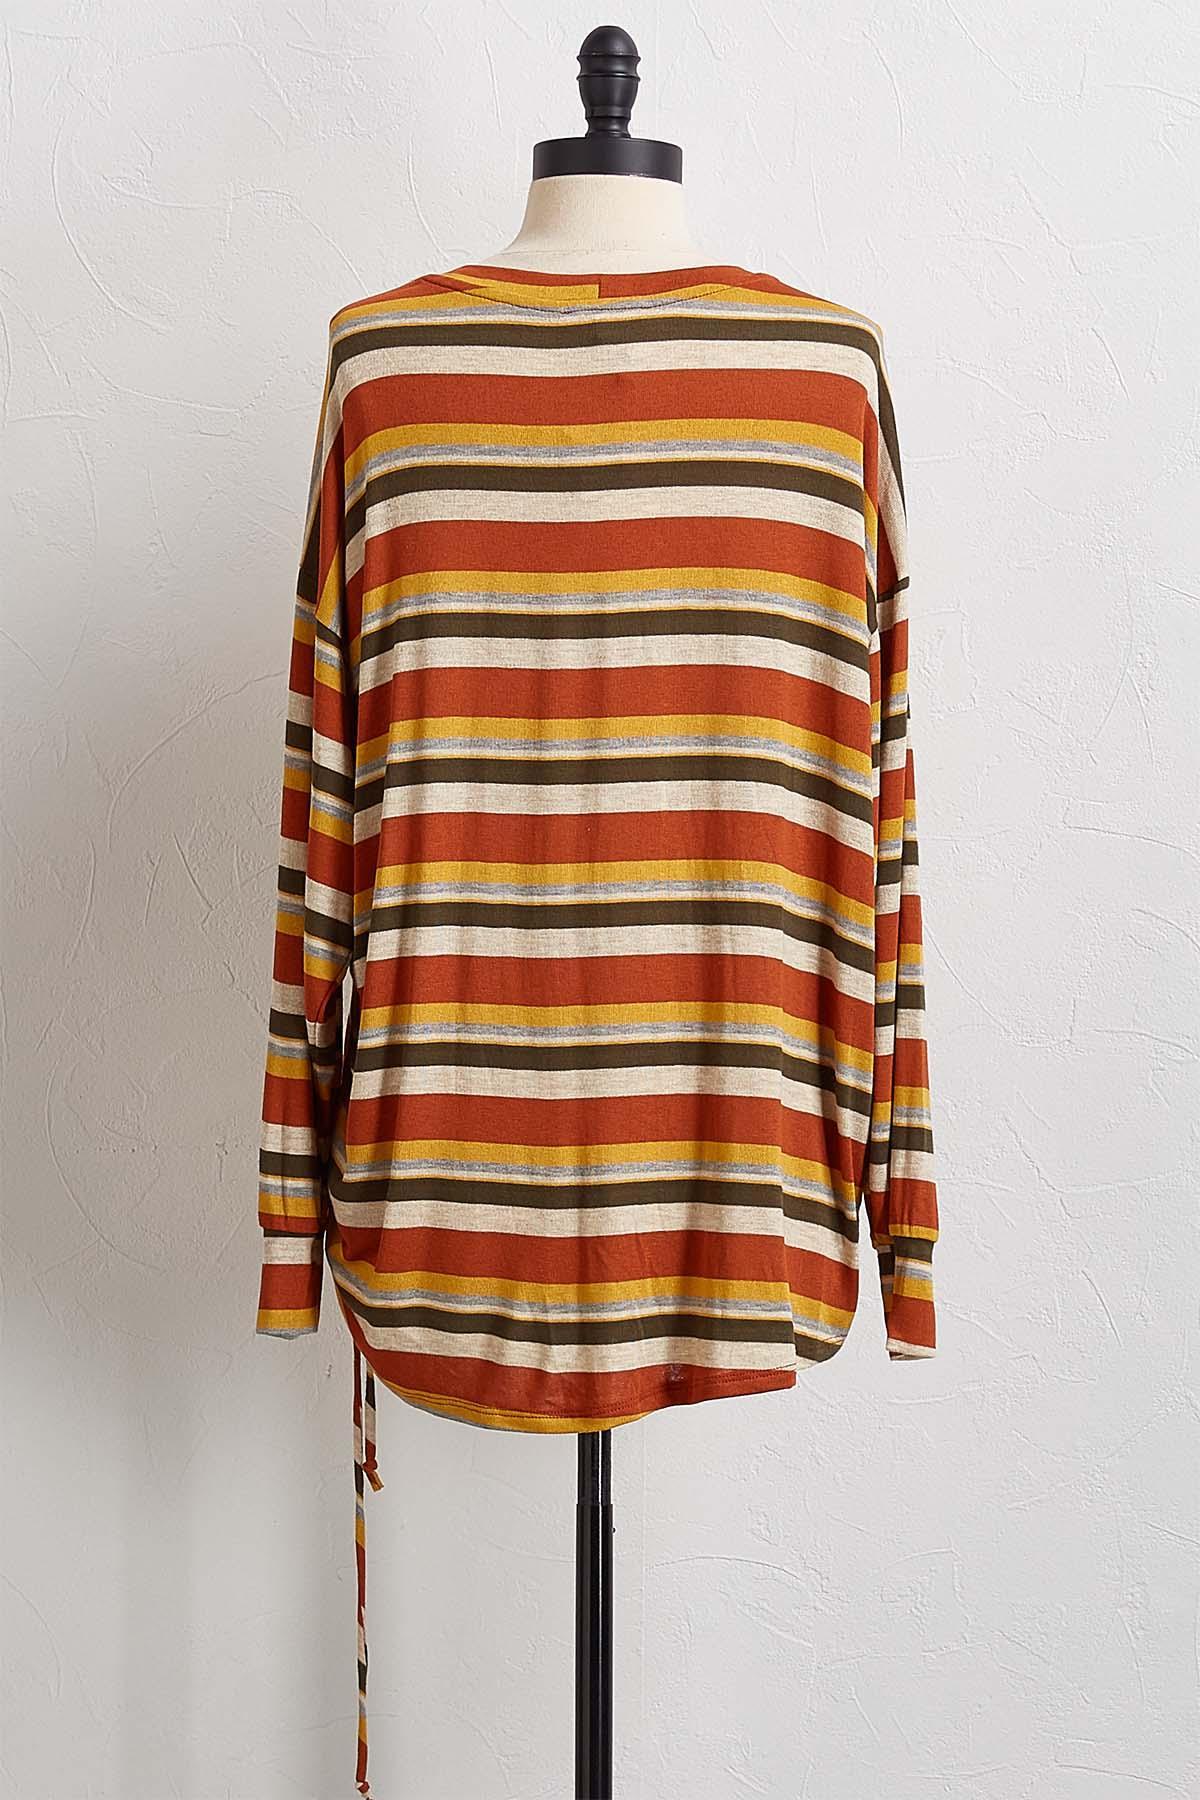 Cinched Rust Stripe Top